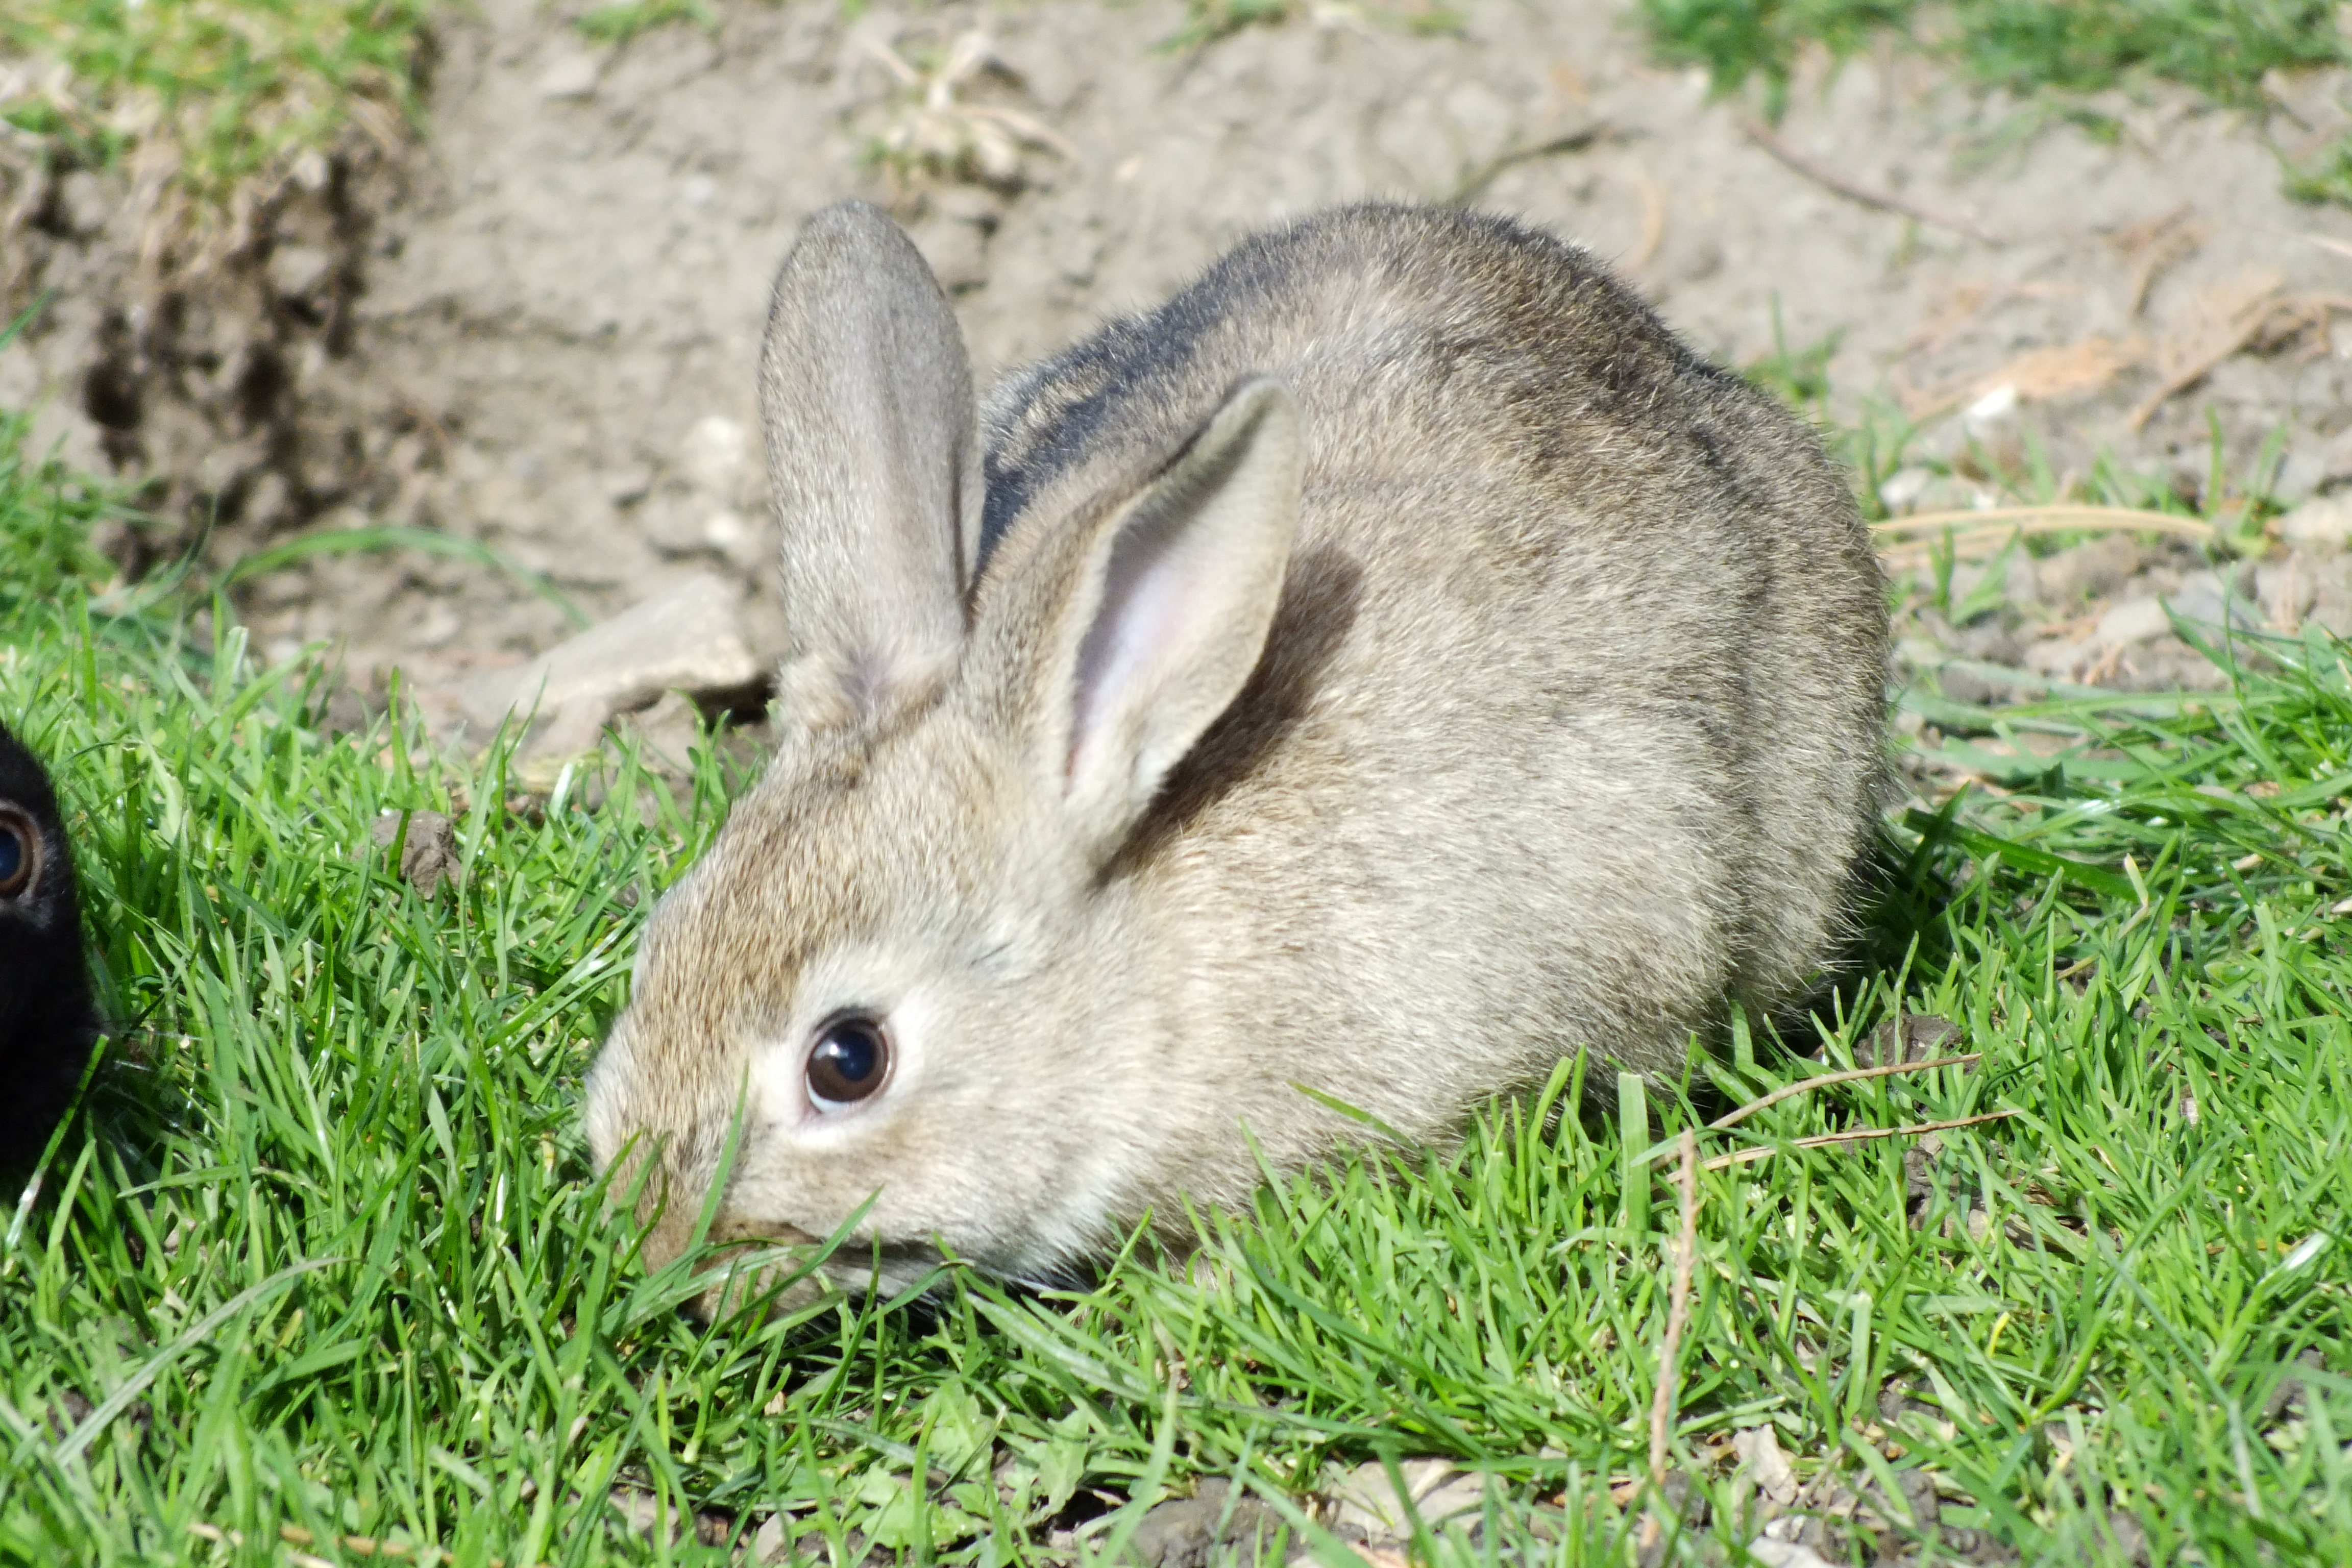 Rabbit, HQ Photo